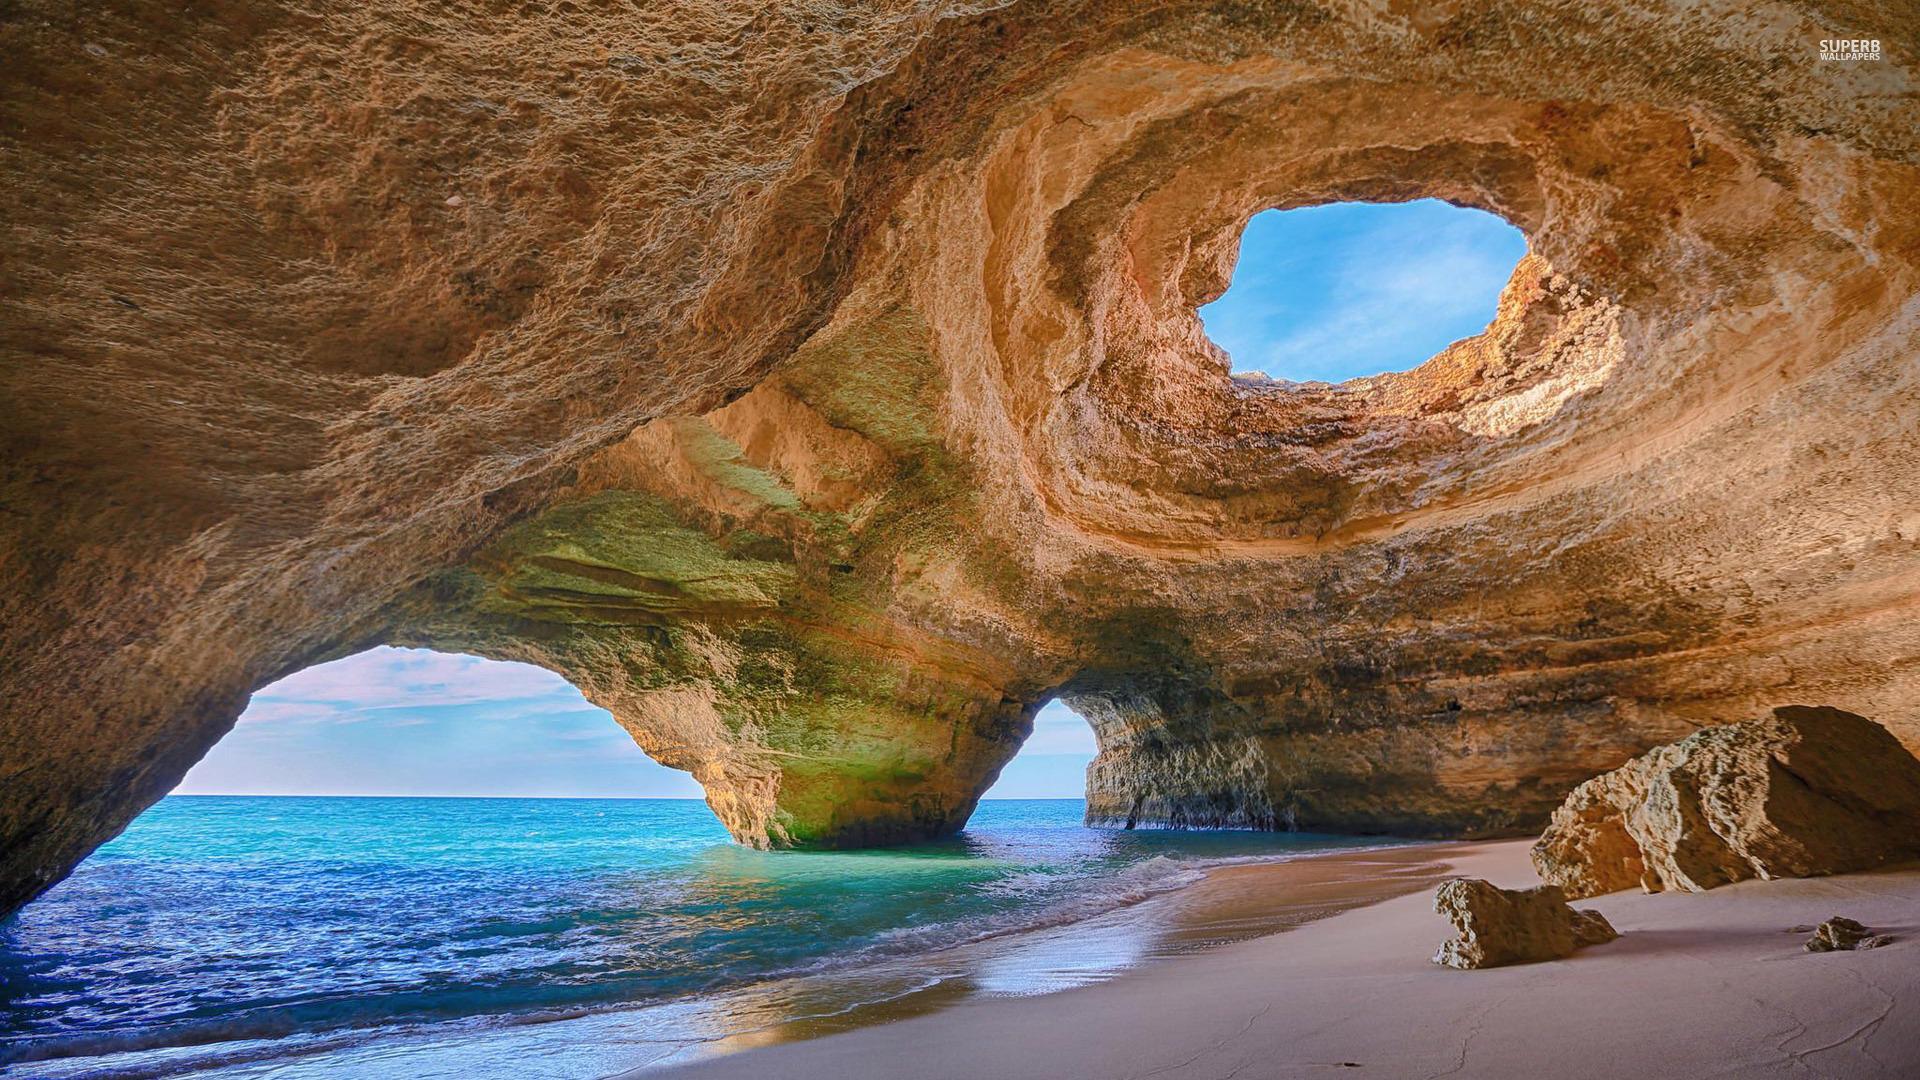 algarve-caves-portugal-28637-1920x1080